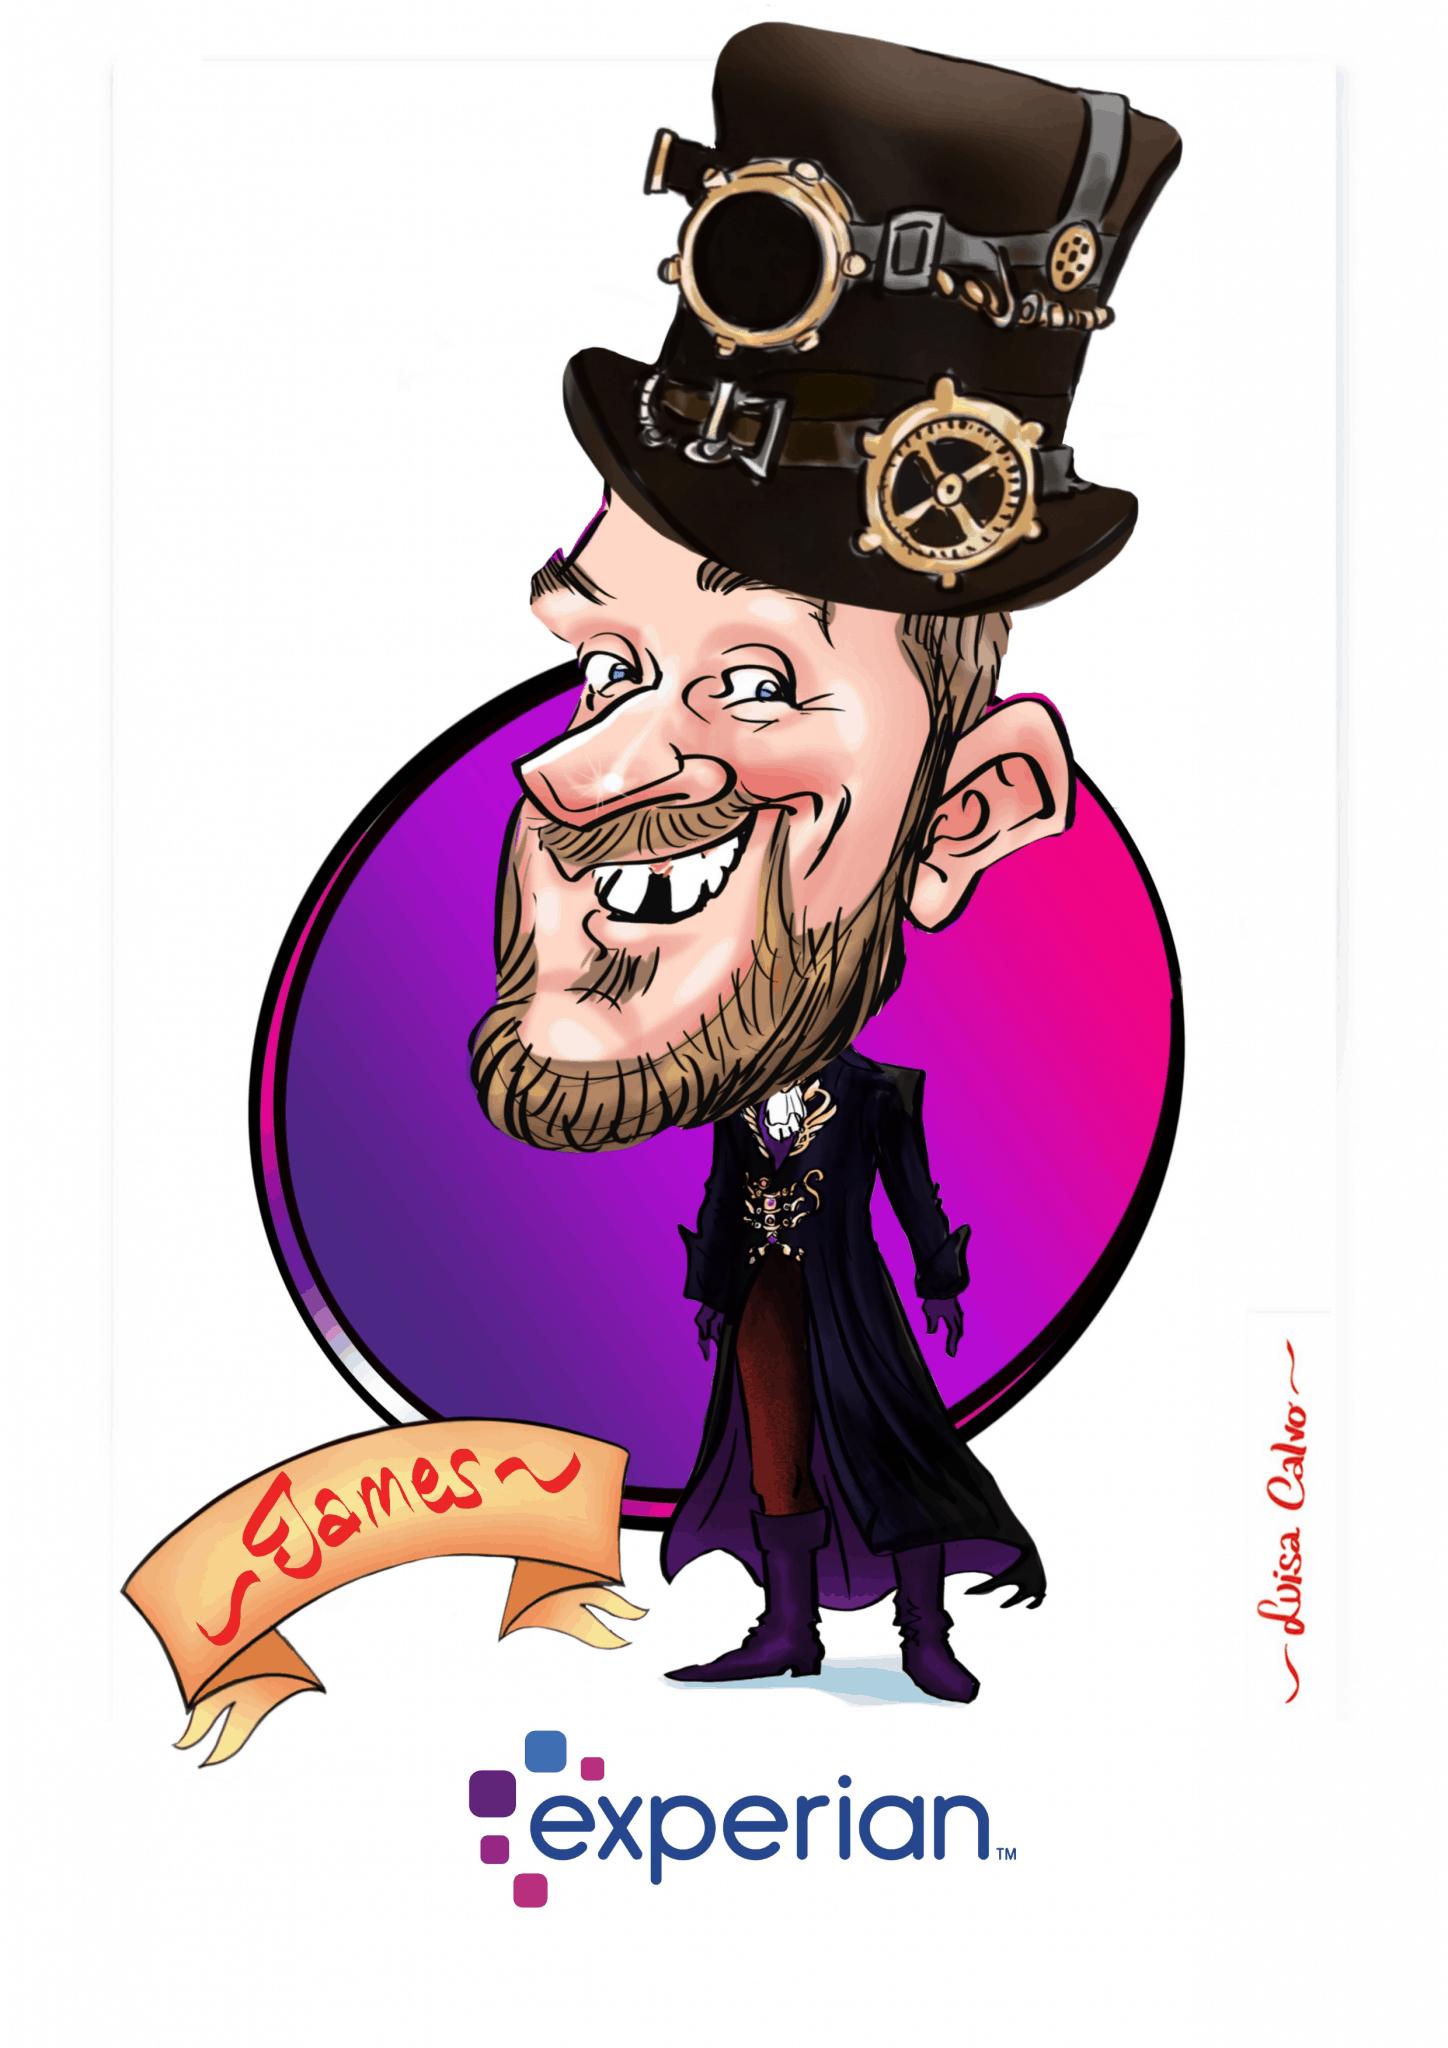 Steeampunk caricature BY LUISA CALVO